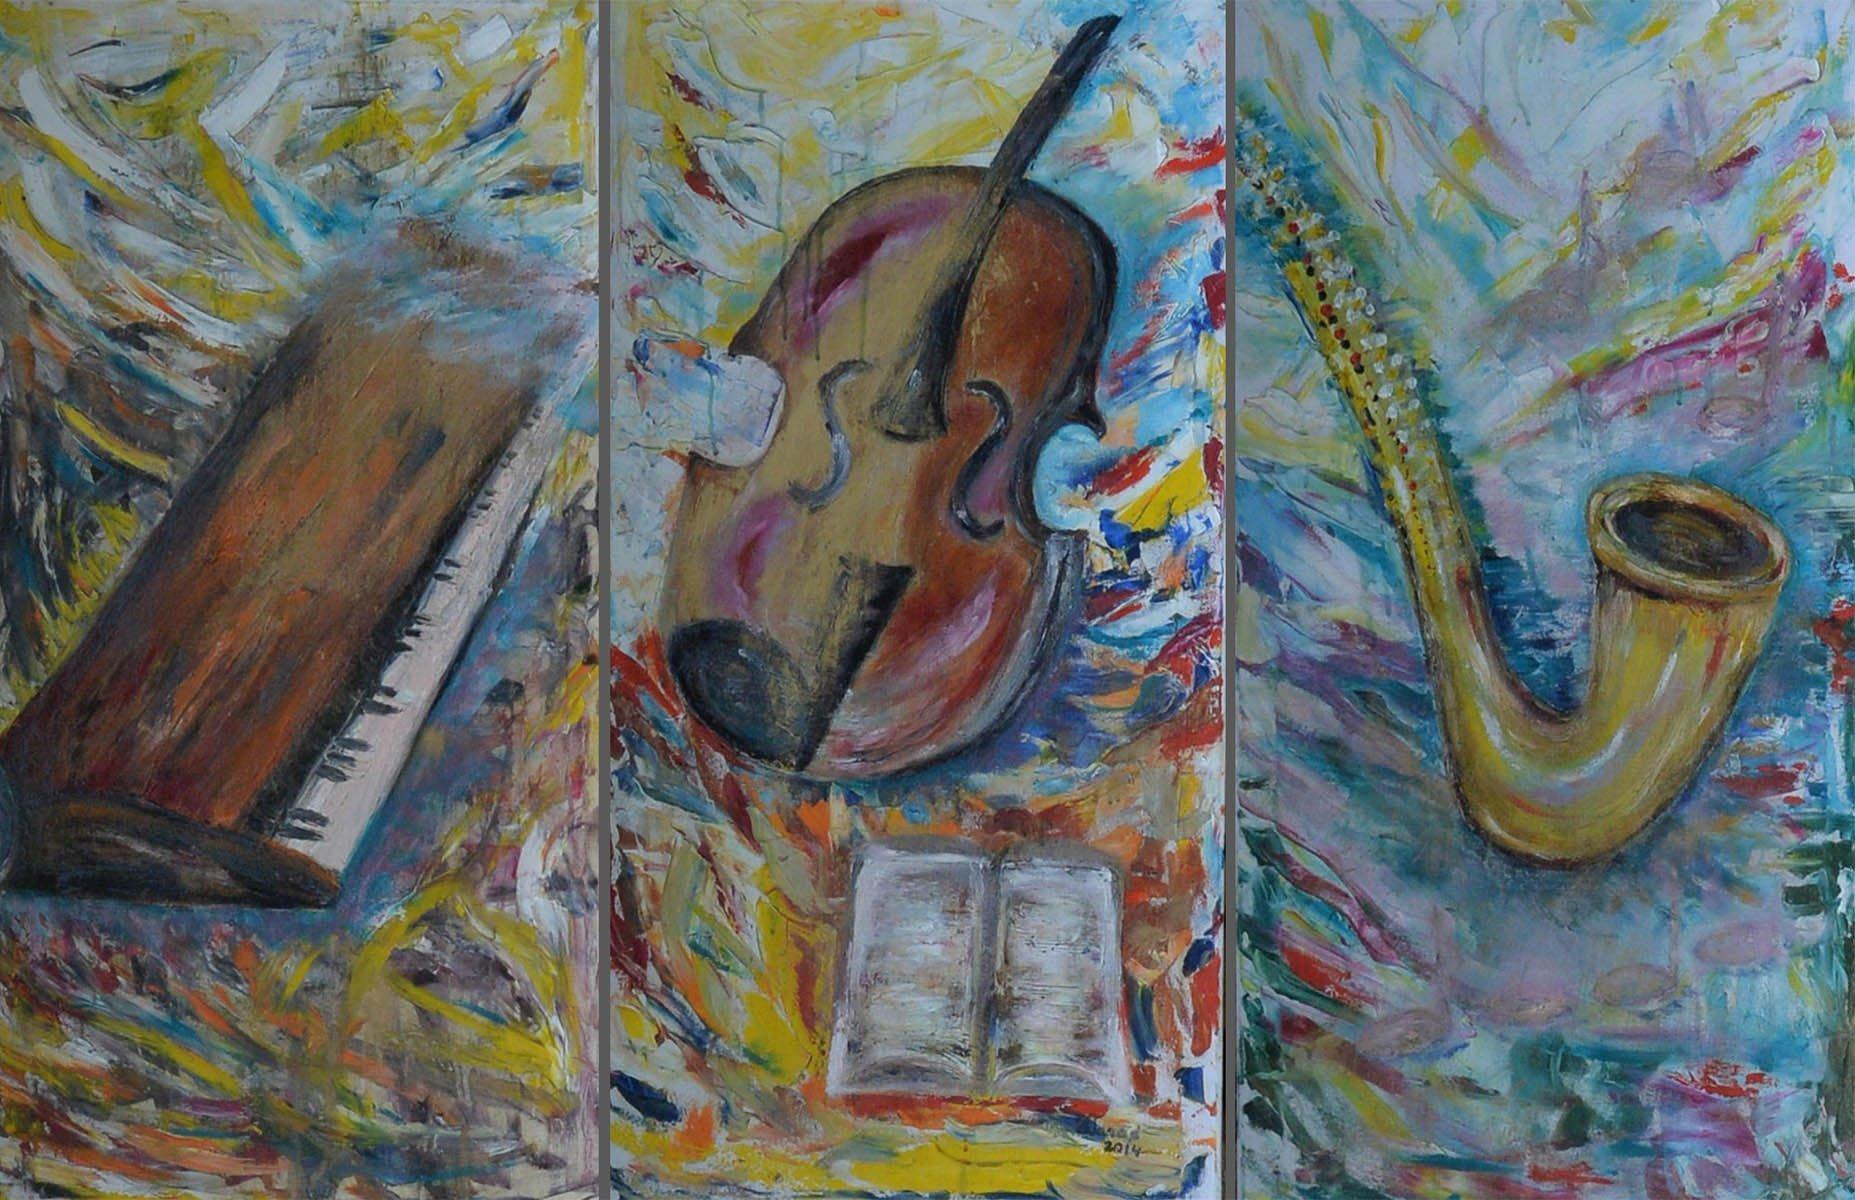 Music Instruments. Triptych